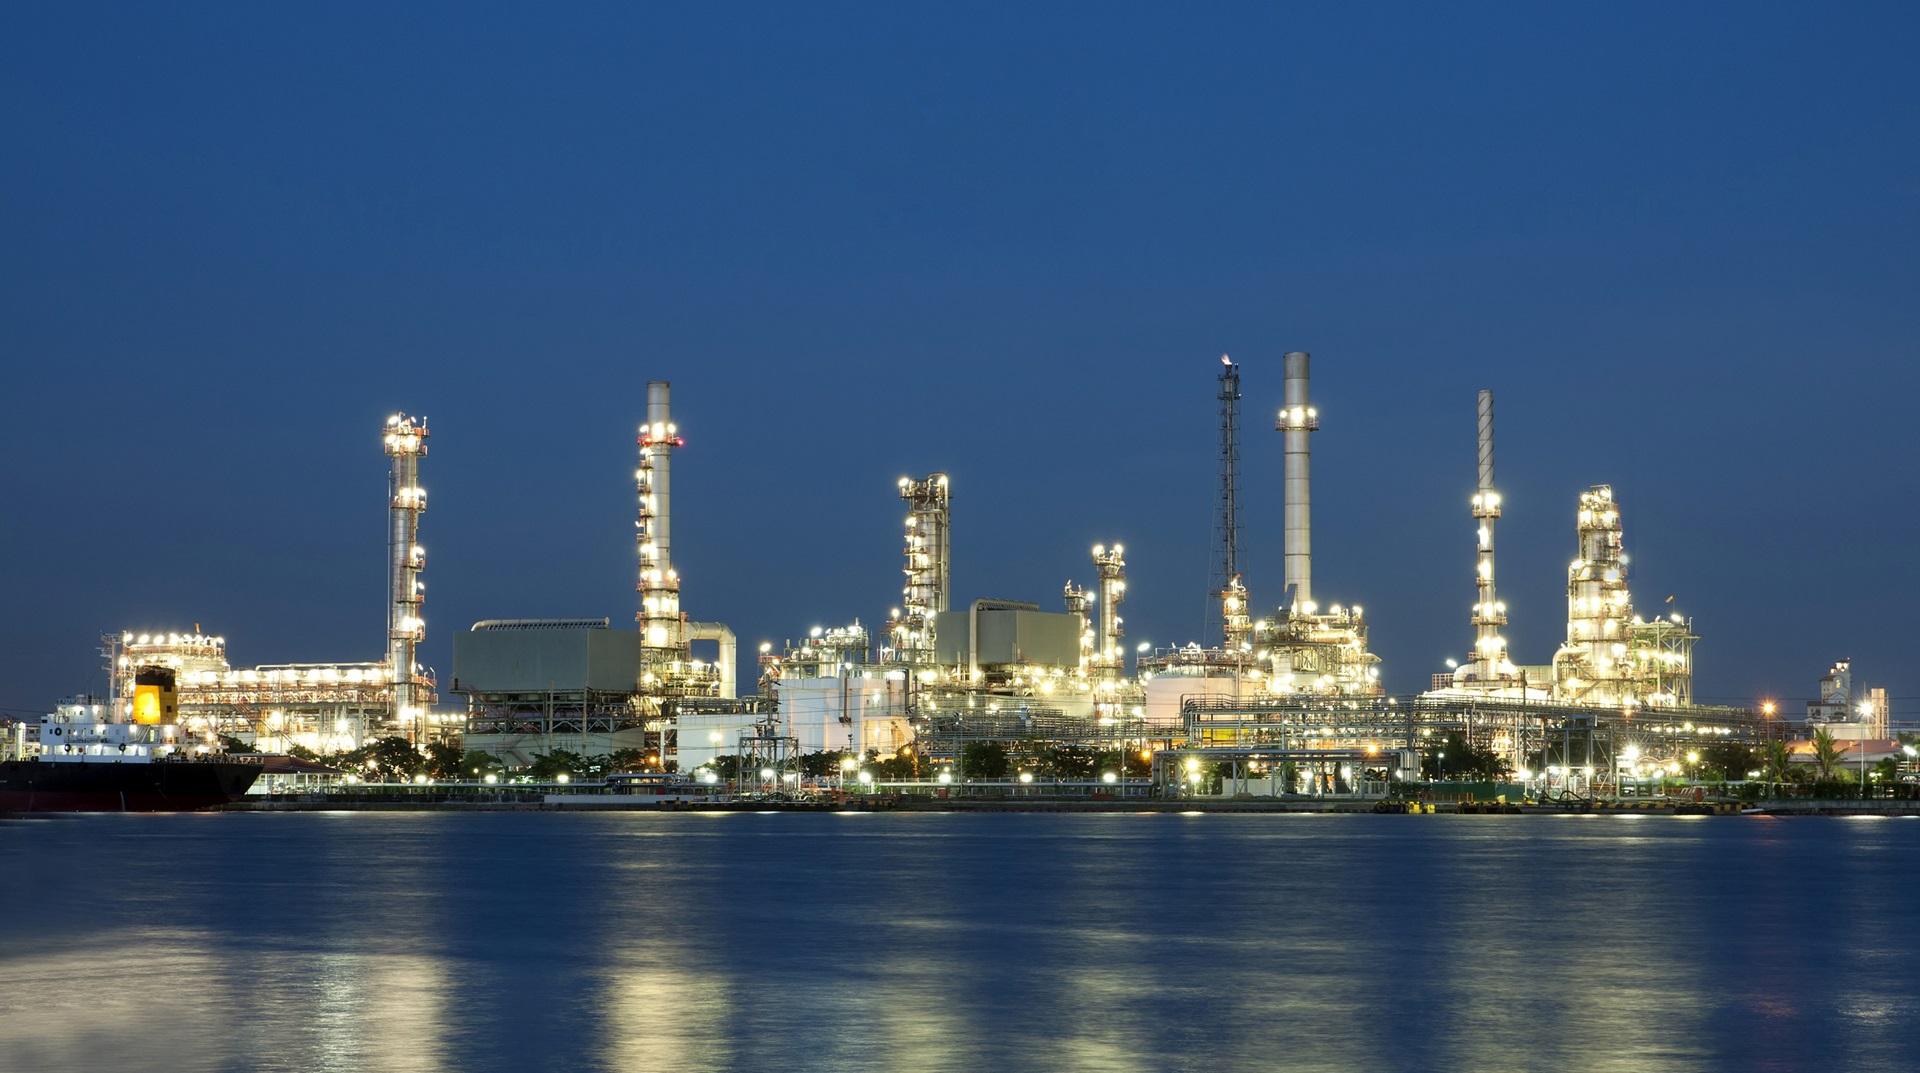 AVK Industrial Nederland